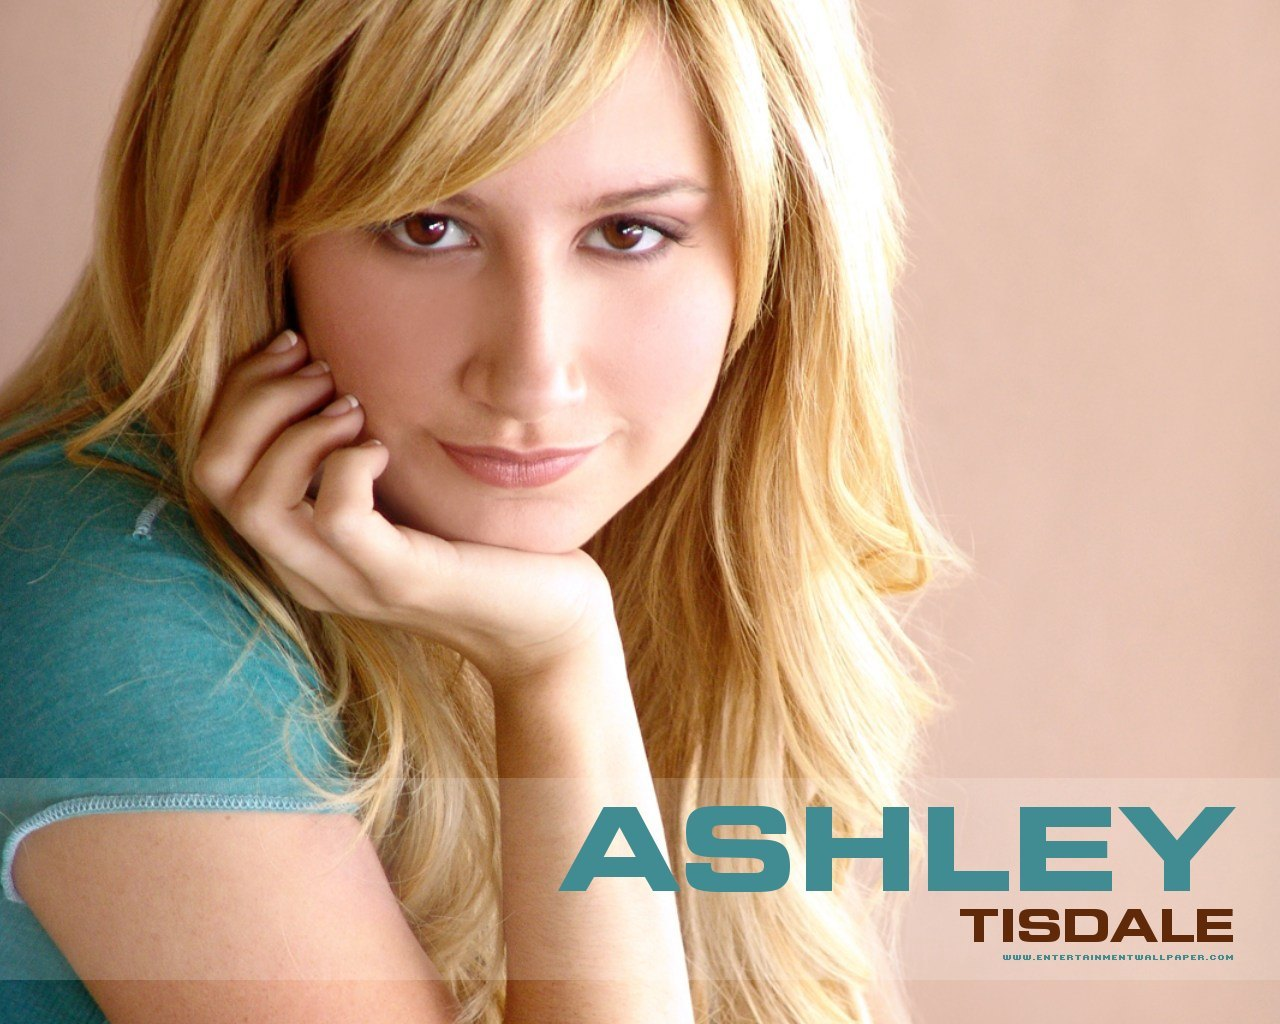 http://1.bp.blogspot.com/-50EE7oGXFxg/T5qwORRS_HI/AAAAAAAAATw/IyzlmvOIZ2M/s1600/Ashley%2BTisdale%2BWallpapers%2B3.jpg